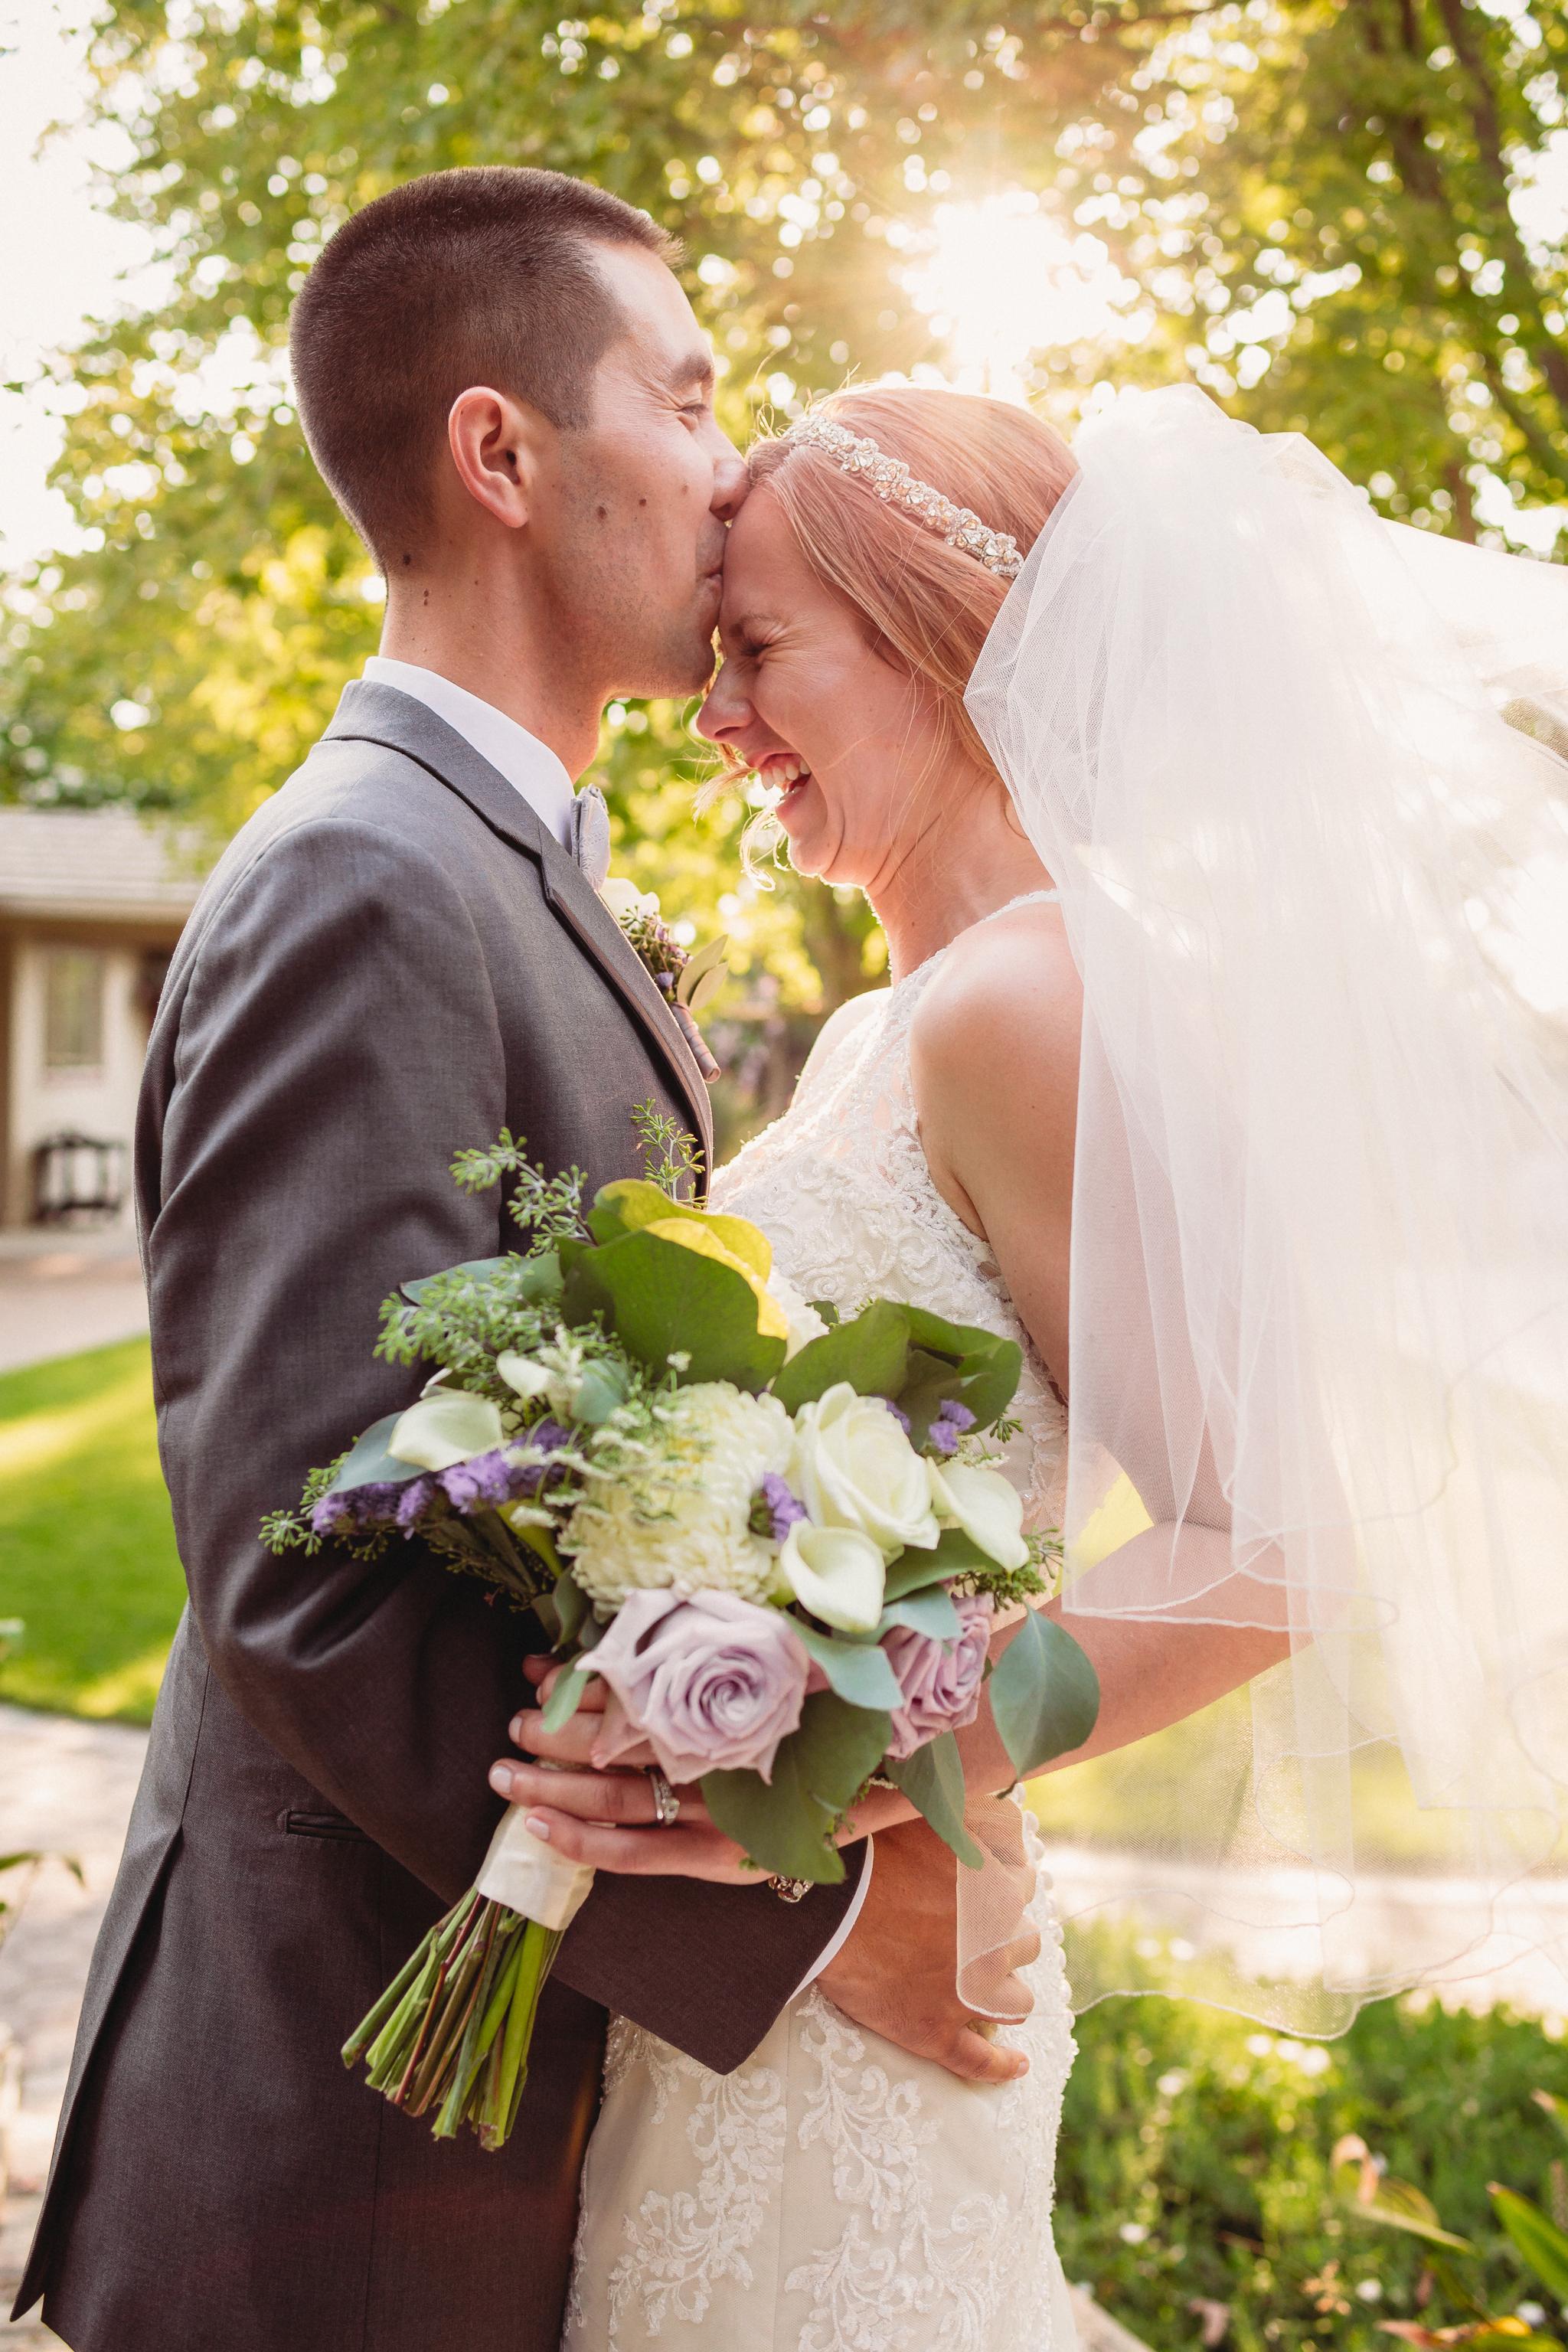 rebeccaylasotras-bay-area-garden-wedding-63.jpg